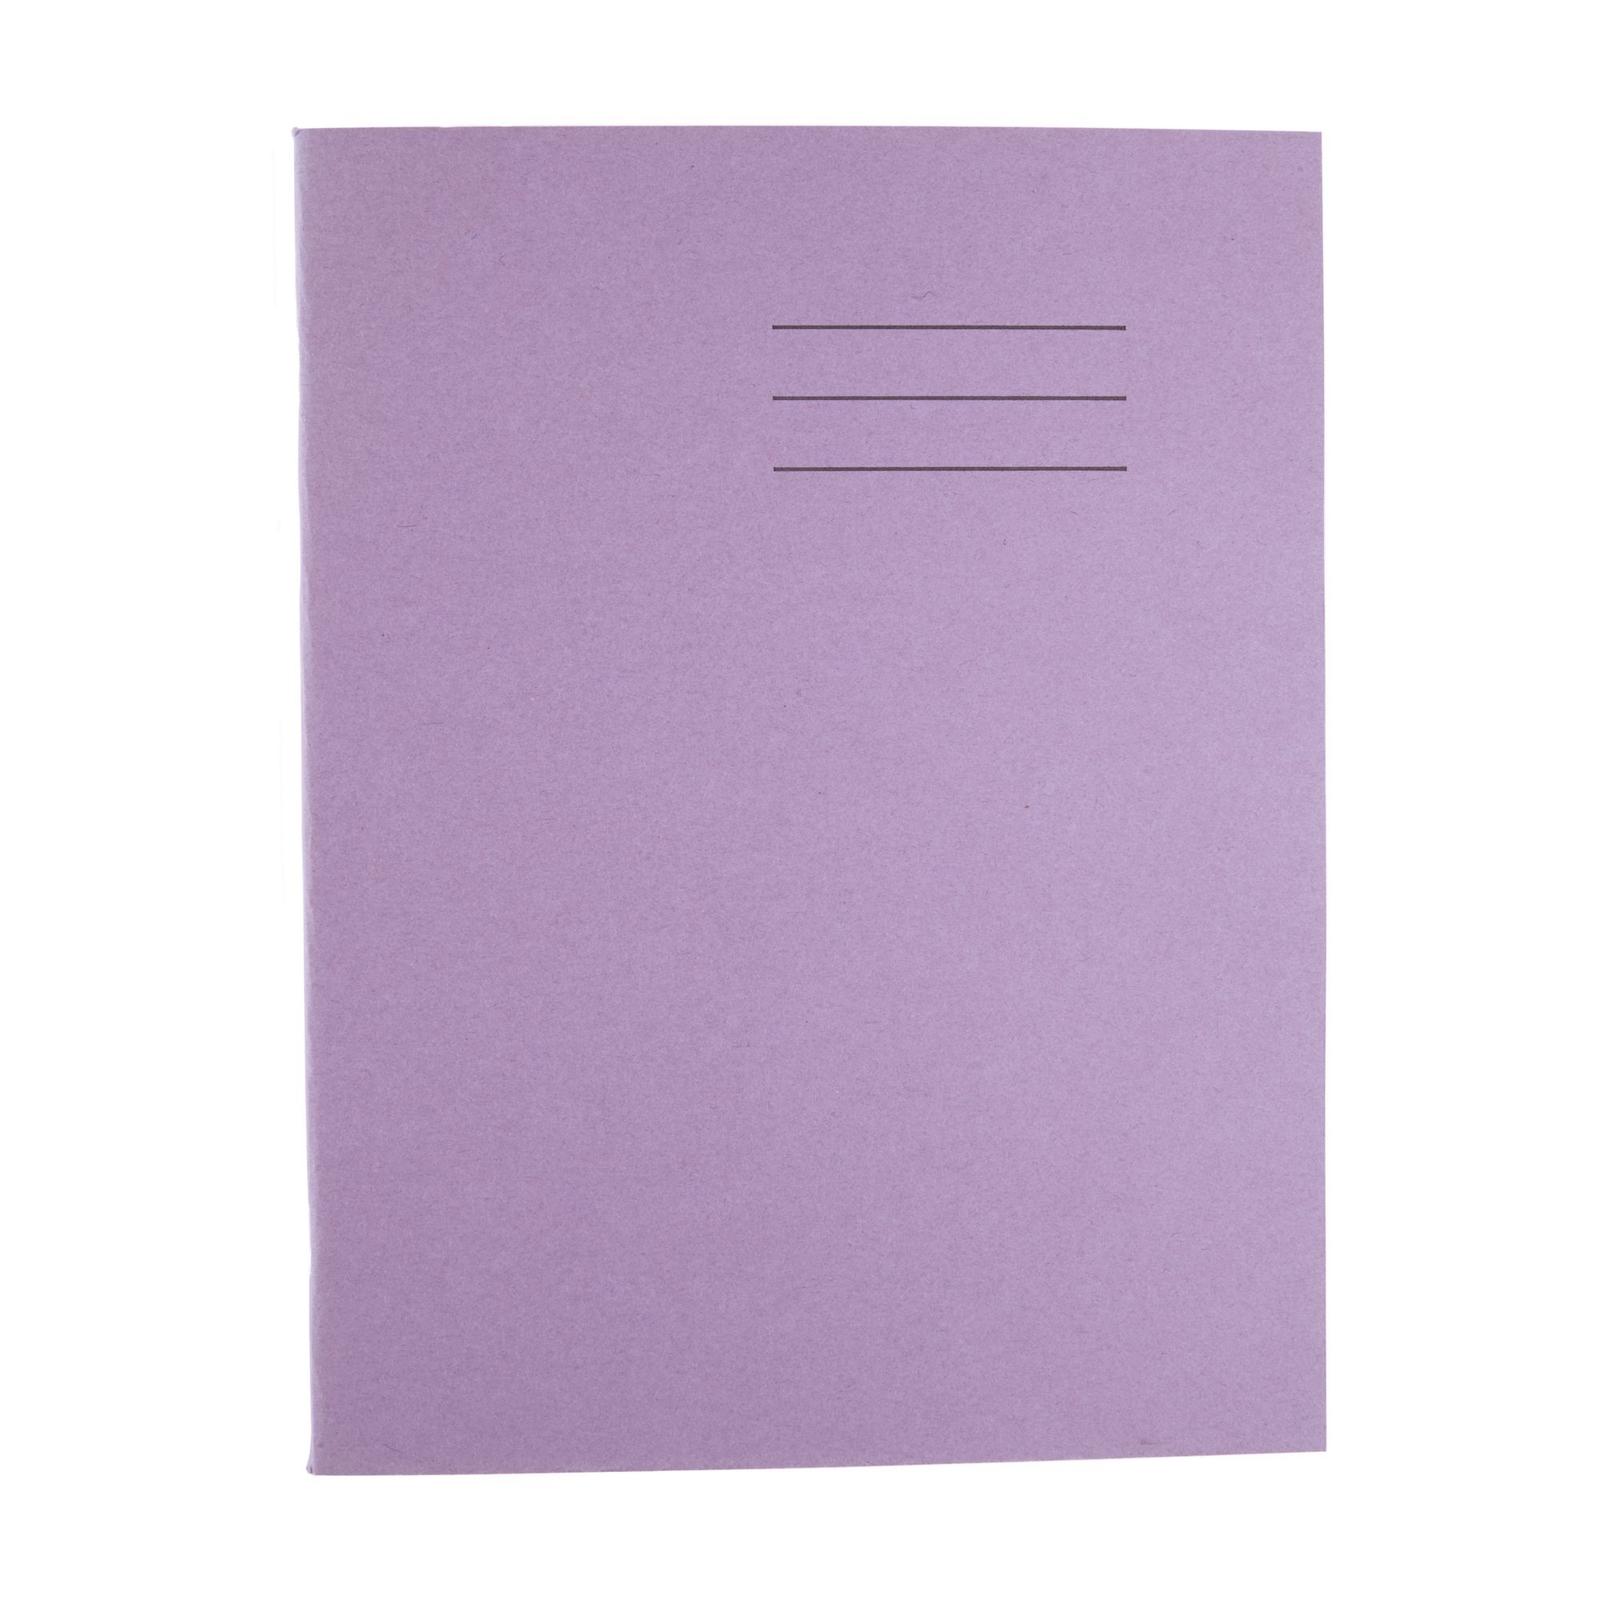 "Handwriting Book 8x6.5"" 40 page Purple P100"